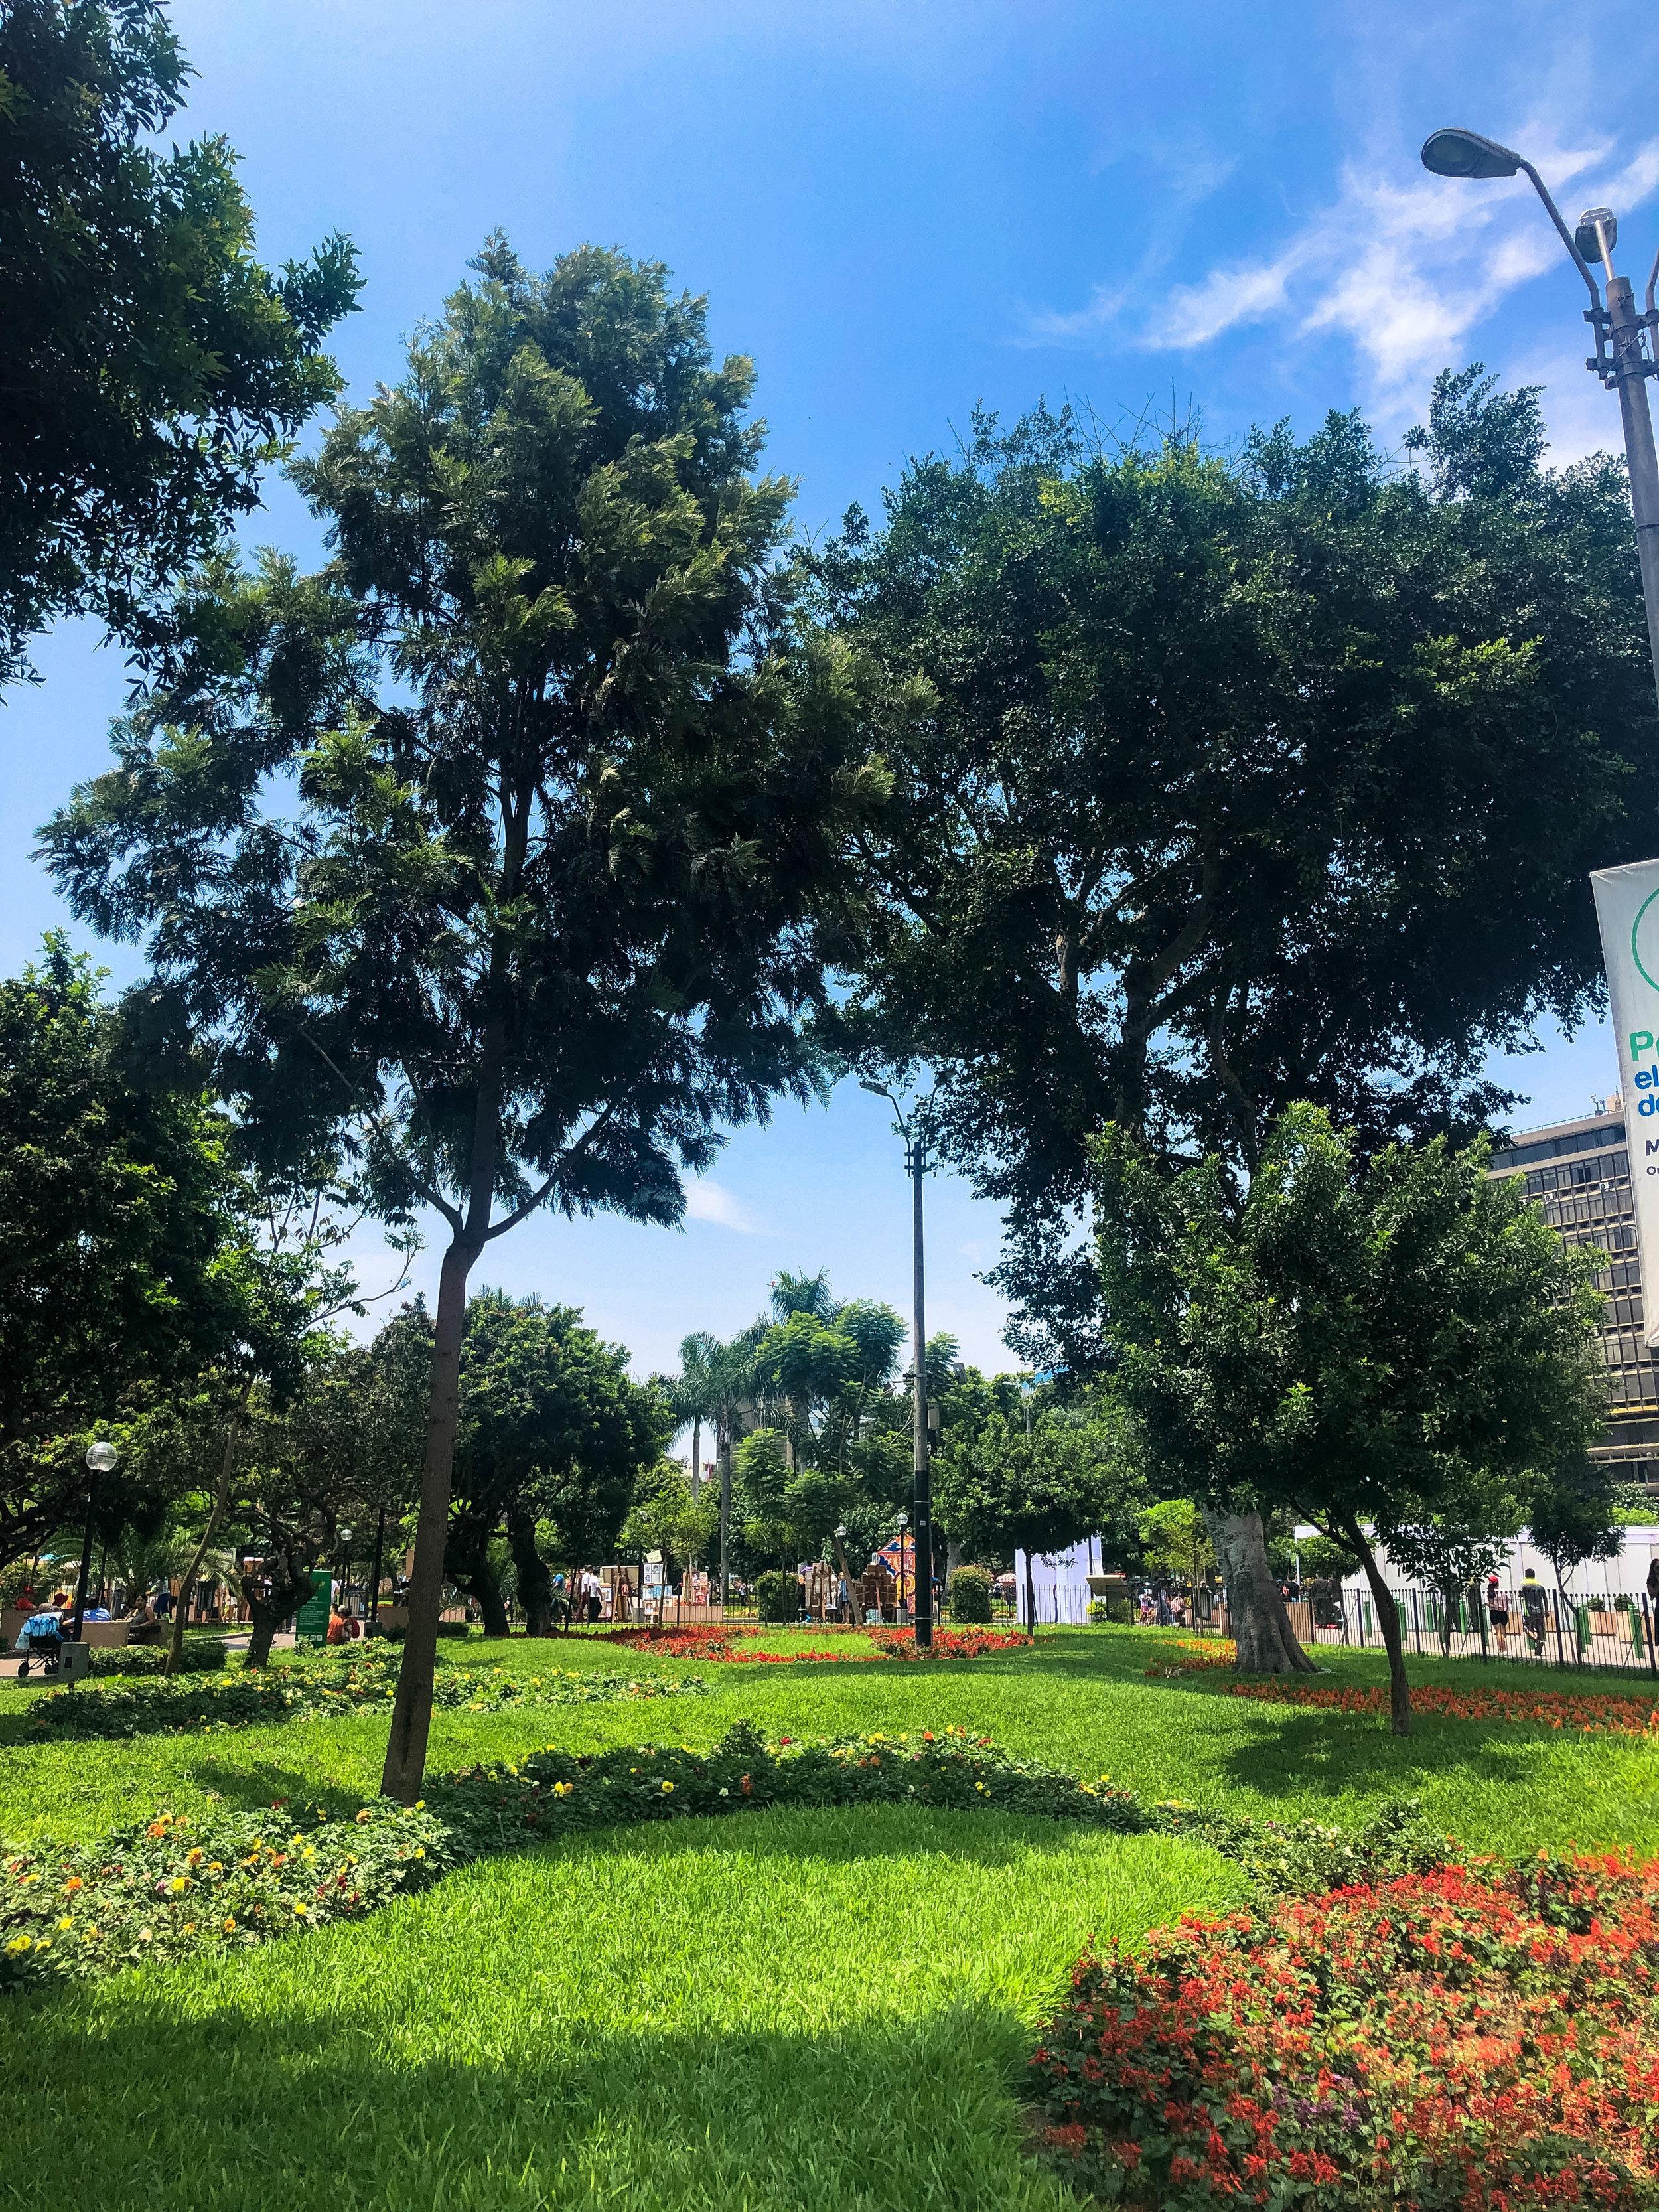 Parks in Miraflores